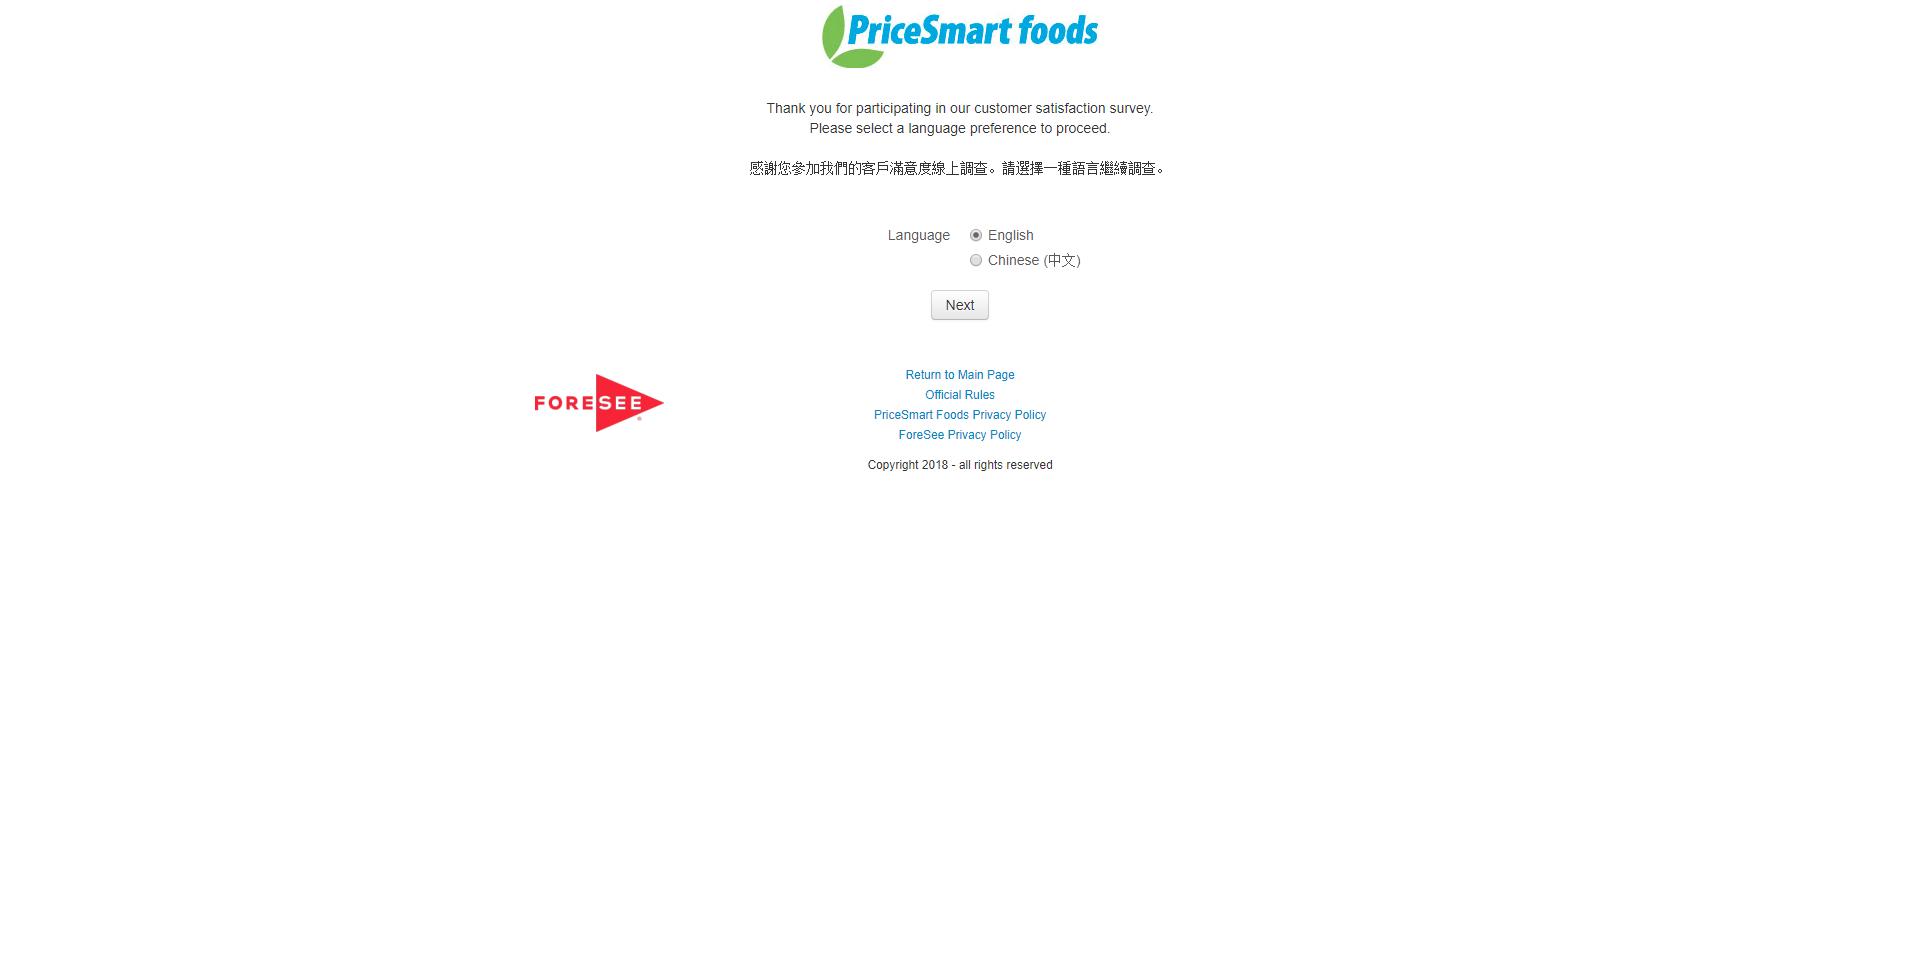 www.pricesmartfoods.ca/survey